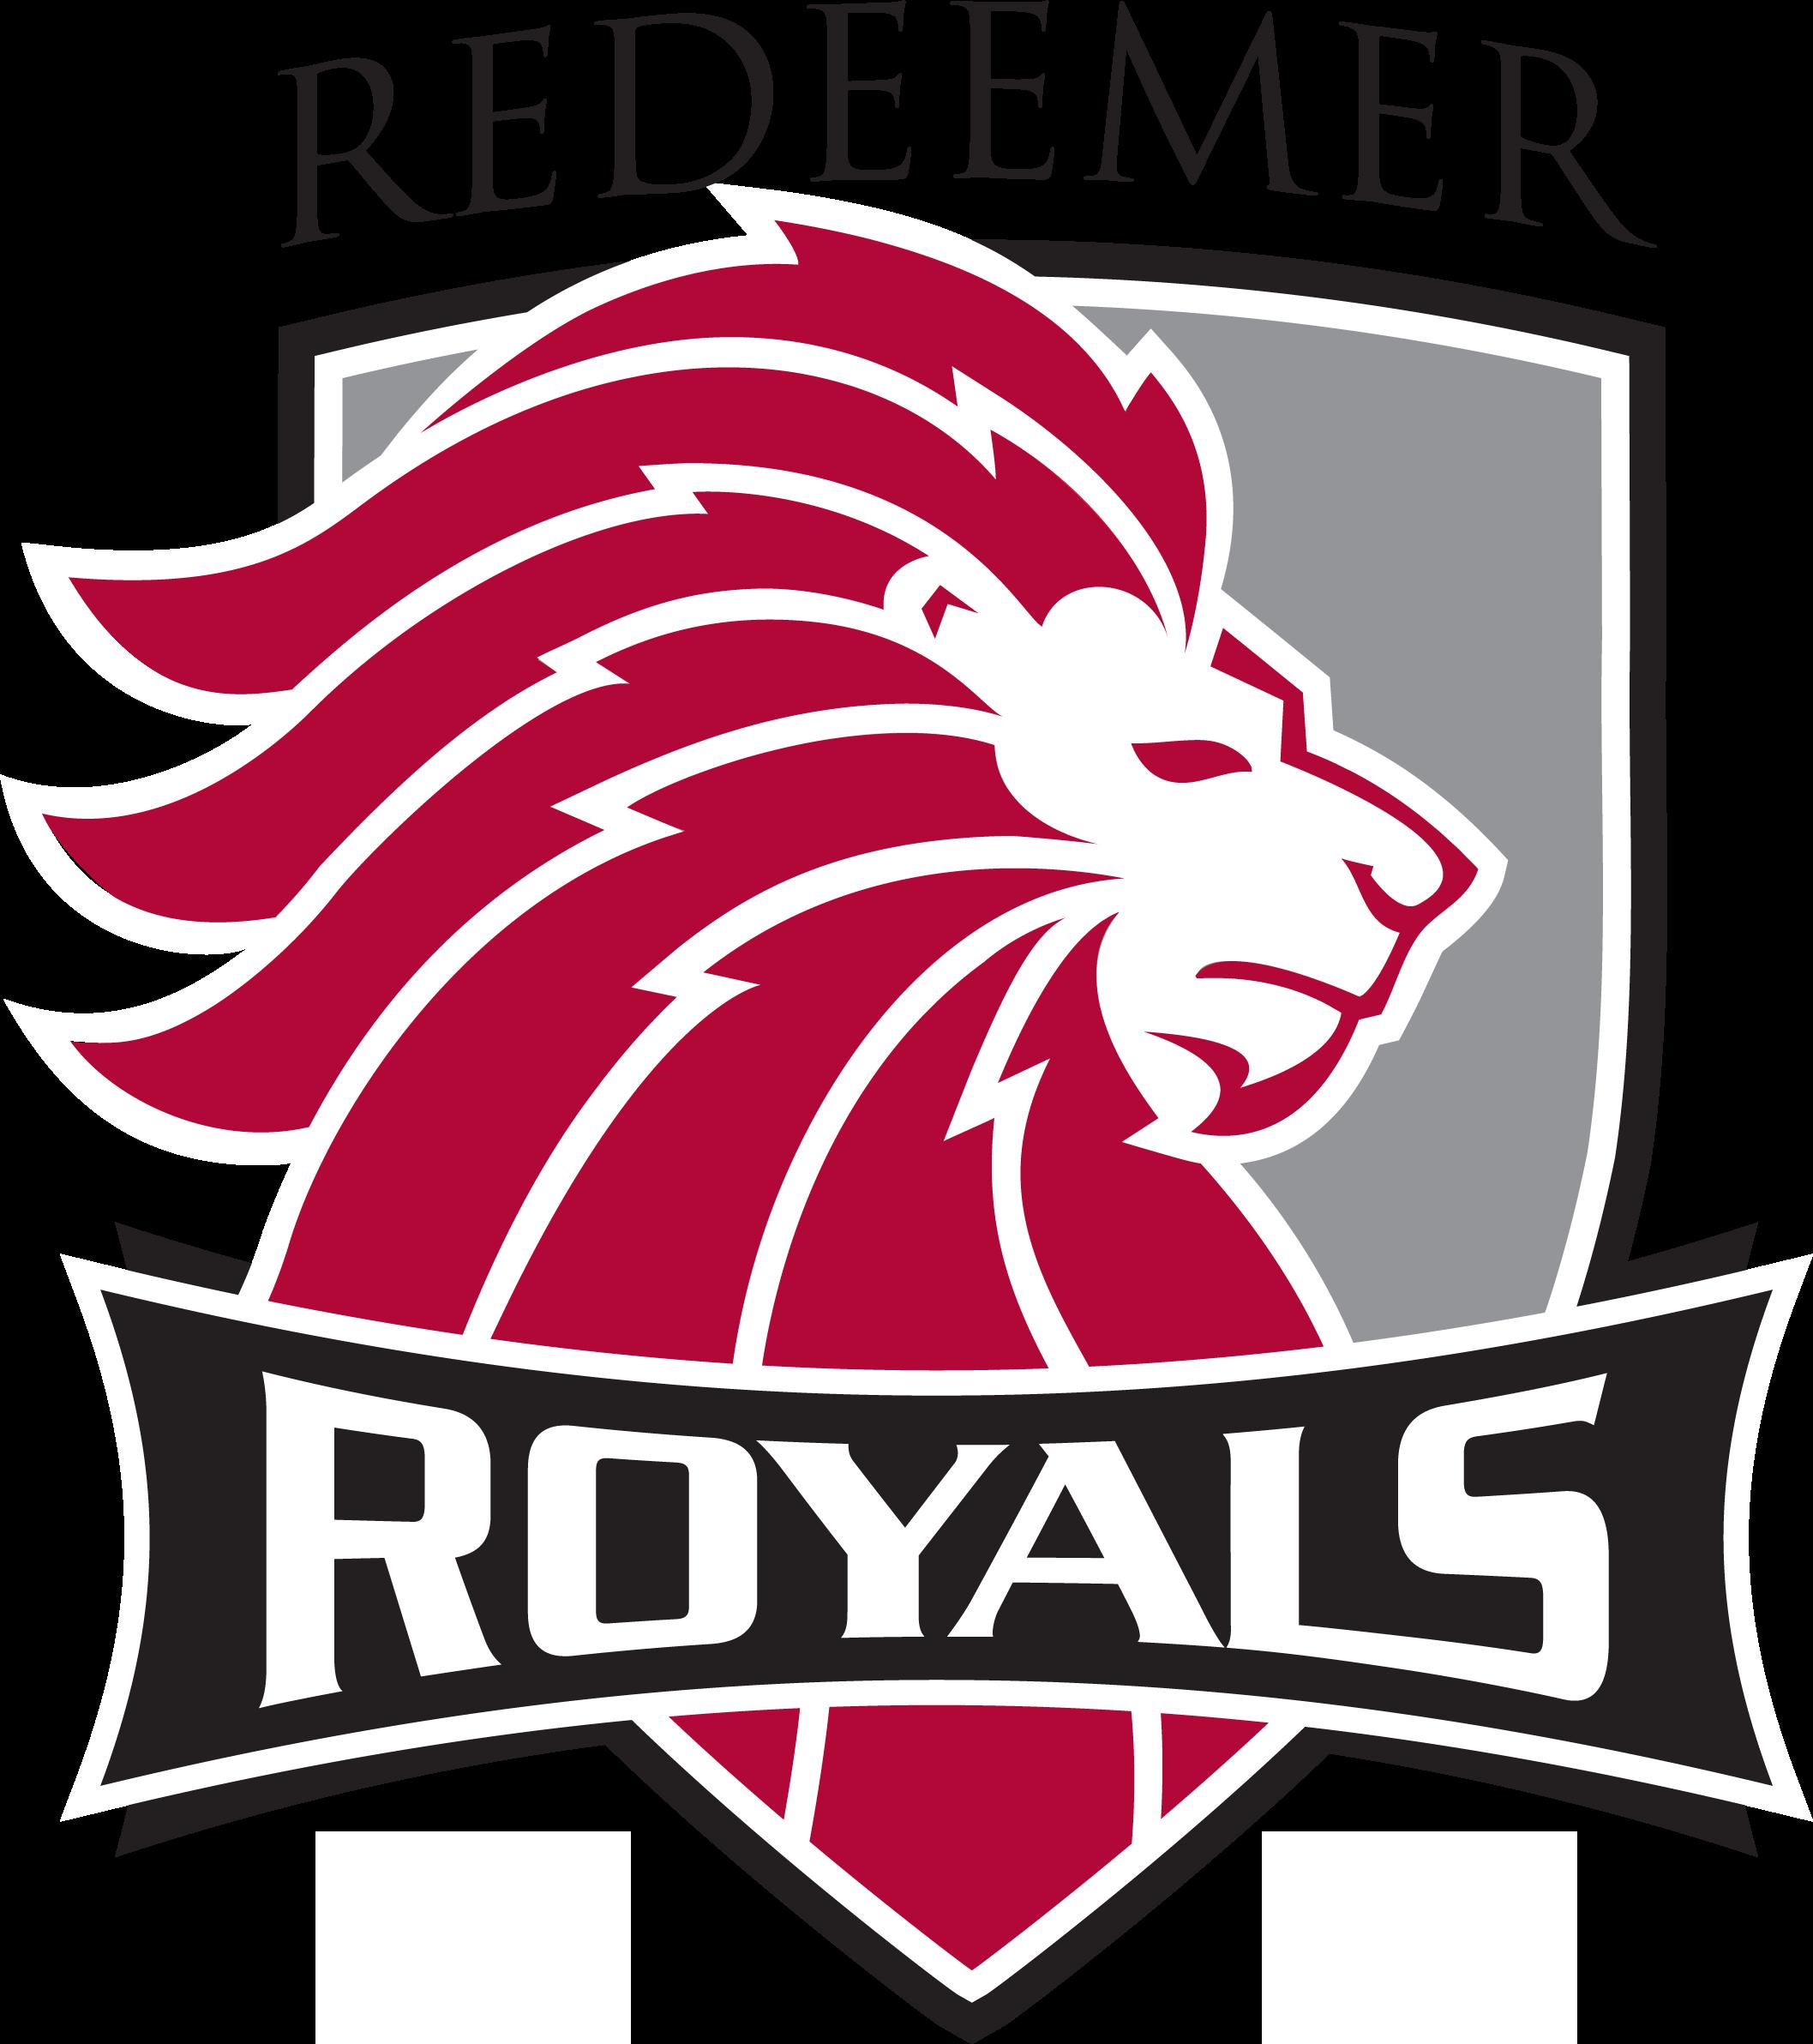 Redeemer University Royals